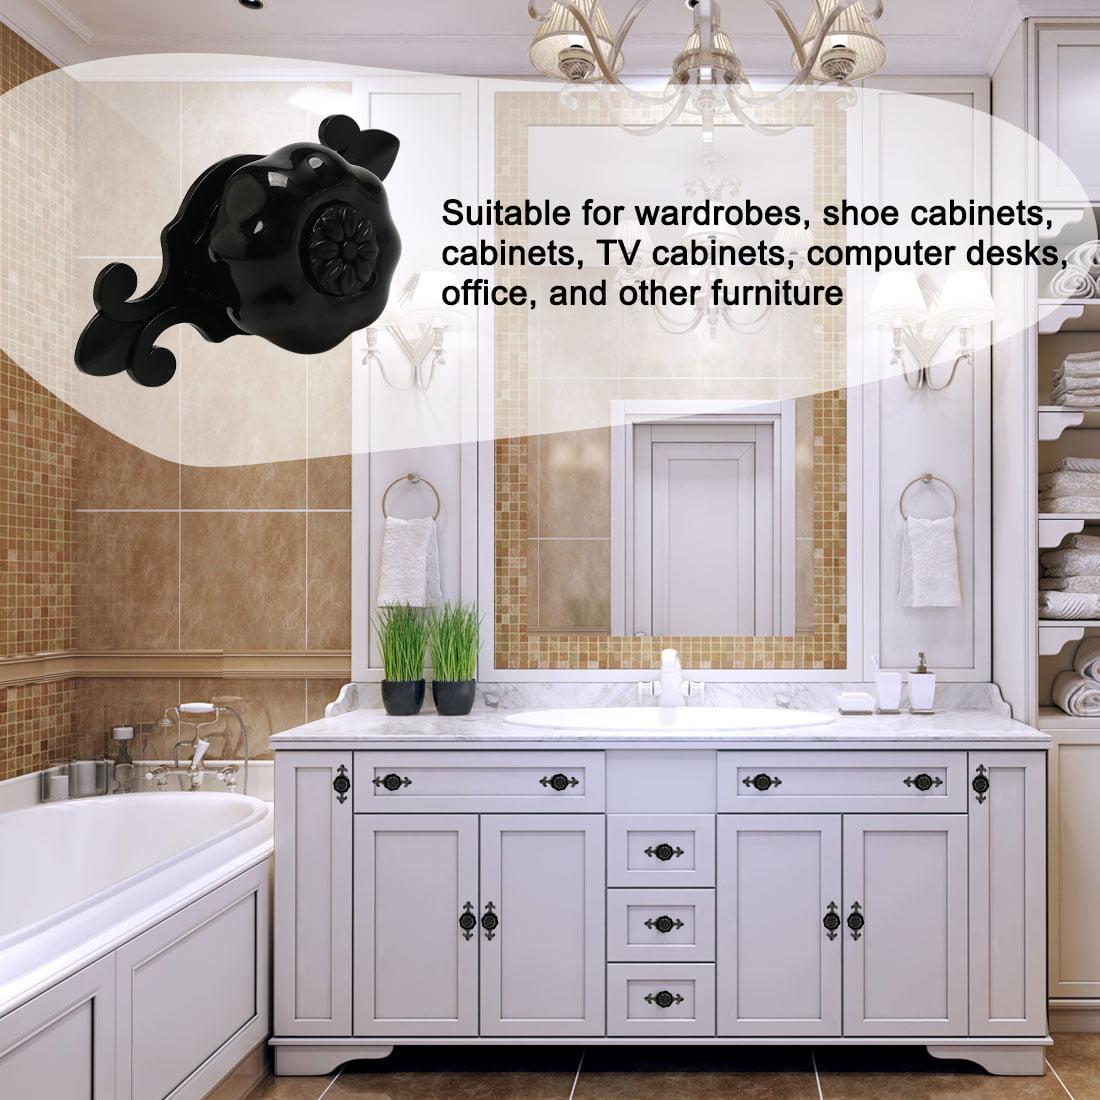 Ceramic Knob Pumpkin Drawer Knob Pull Handle Door Cupboard Wardrobe 6pcs Black - image 7 de 8